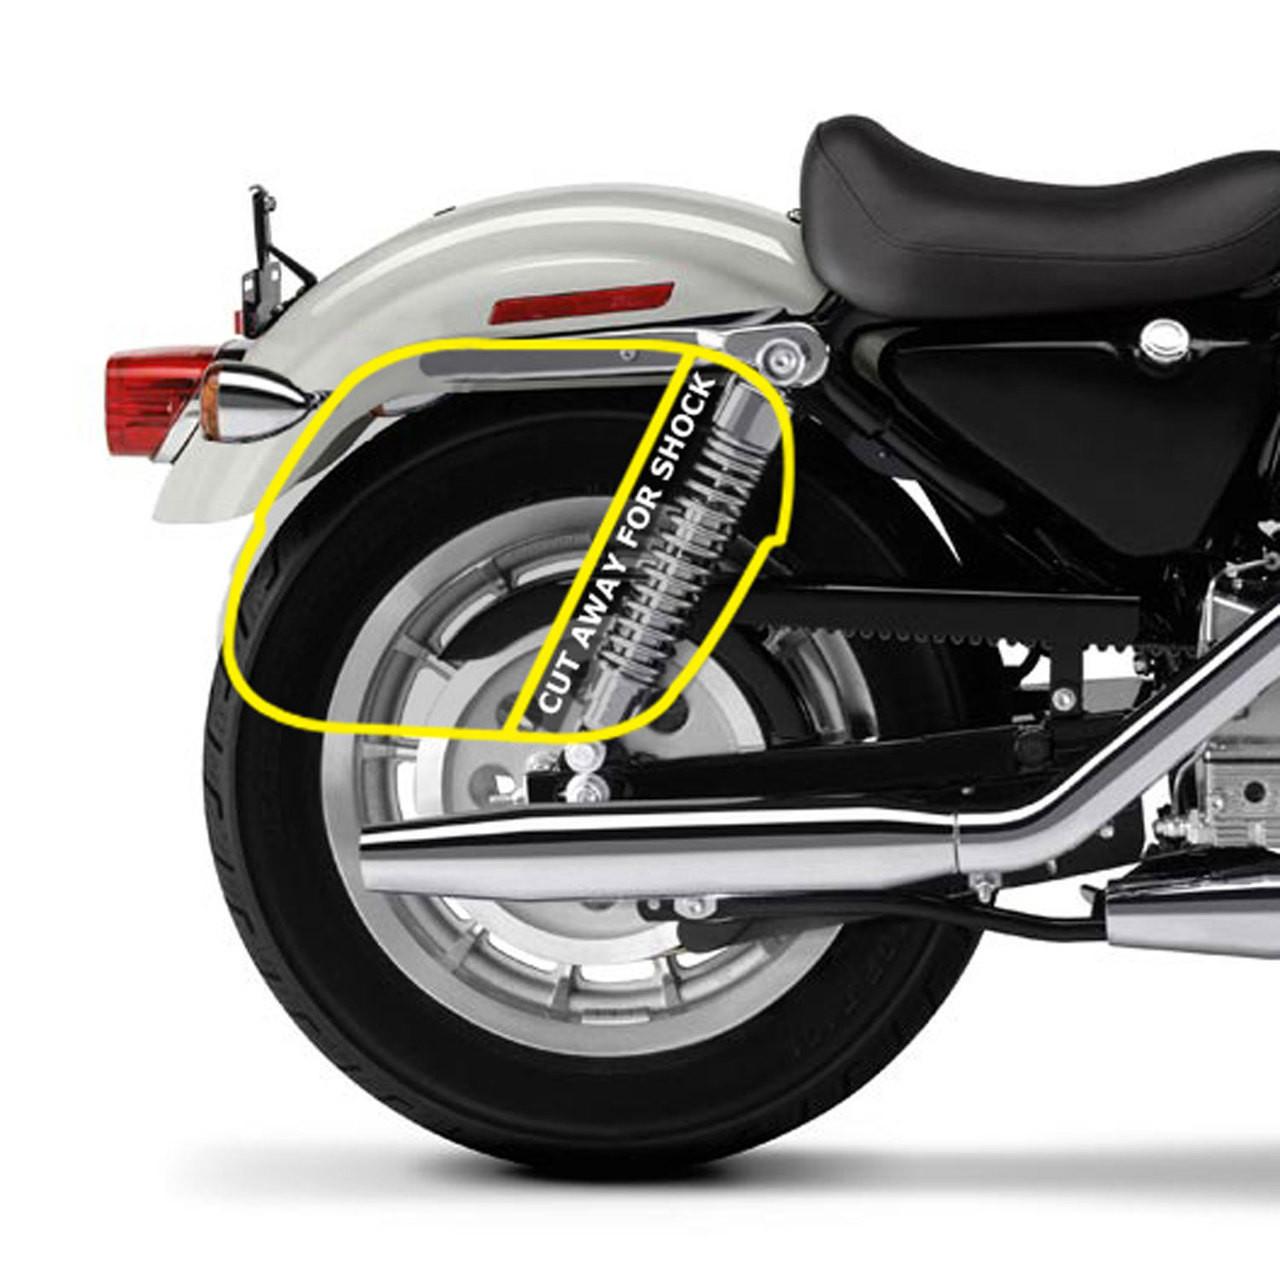 Viking Armor Shock Cutout Motorcycle Saddlebags Bag Placement